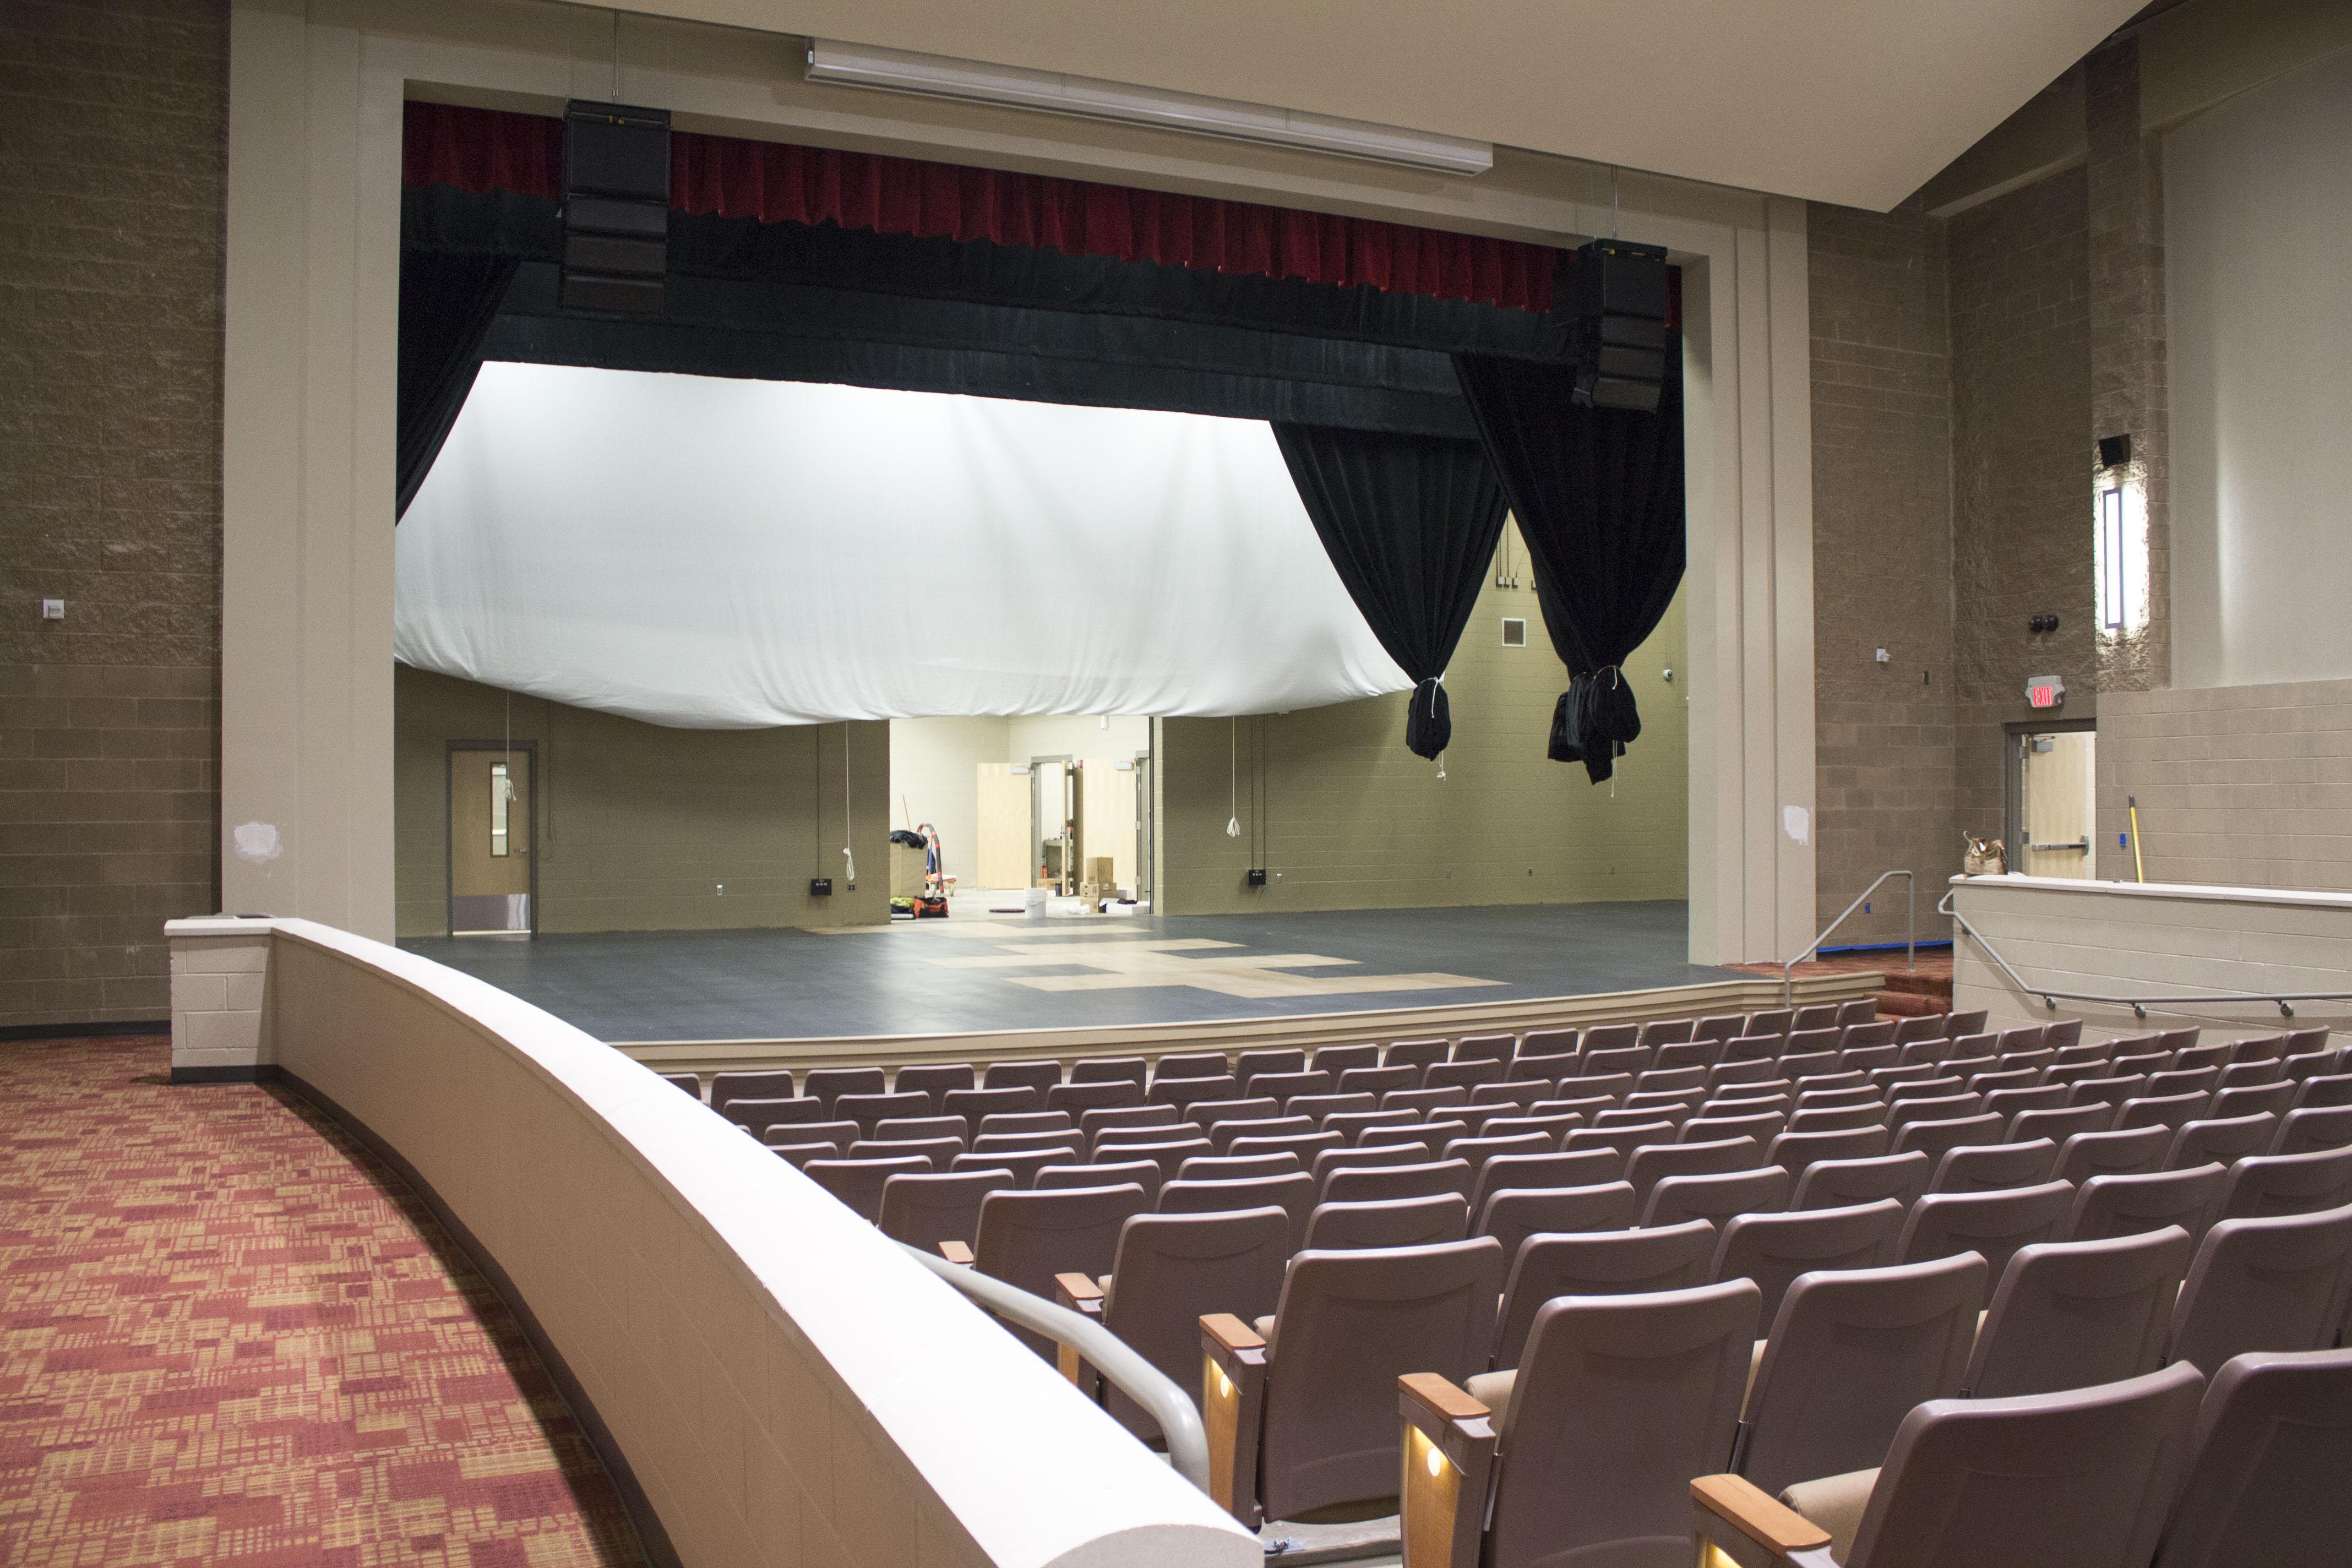 The Alberta School Of Performing Arts